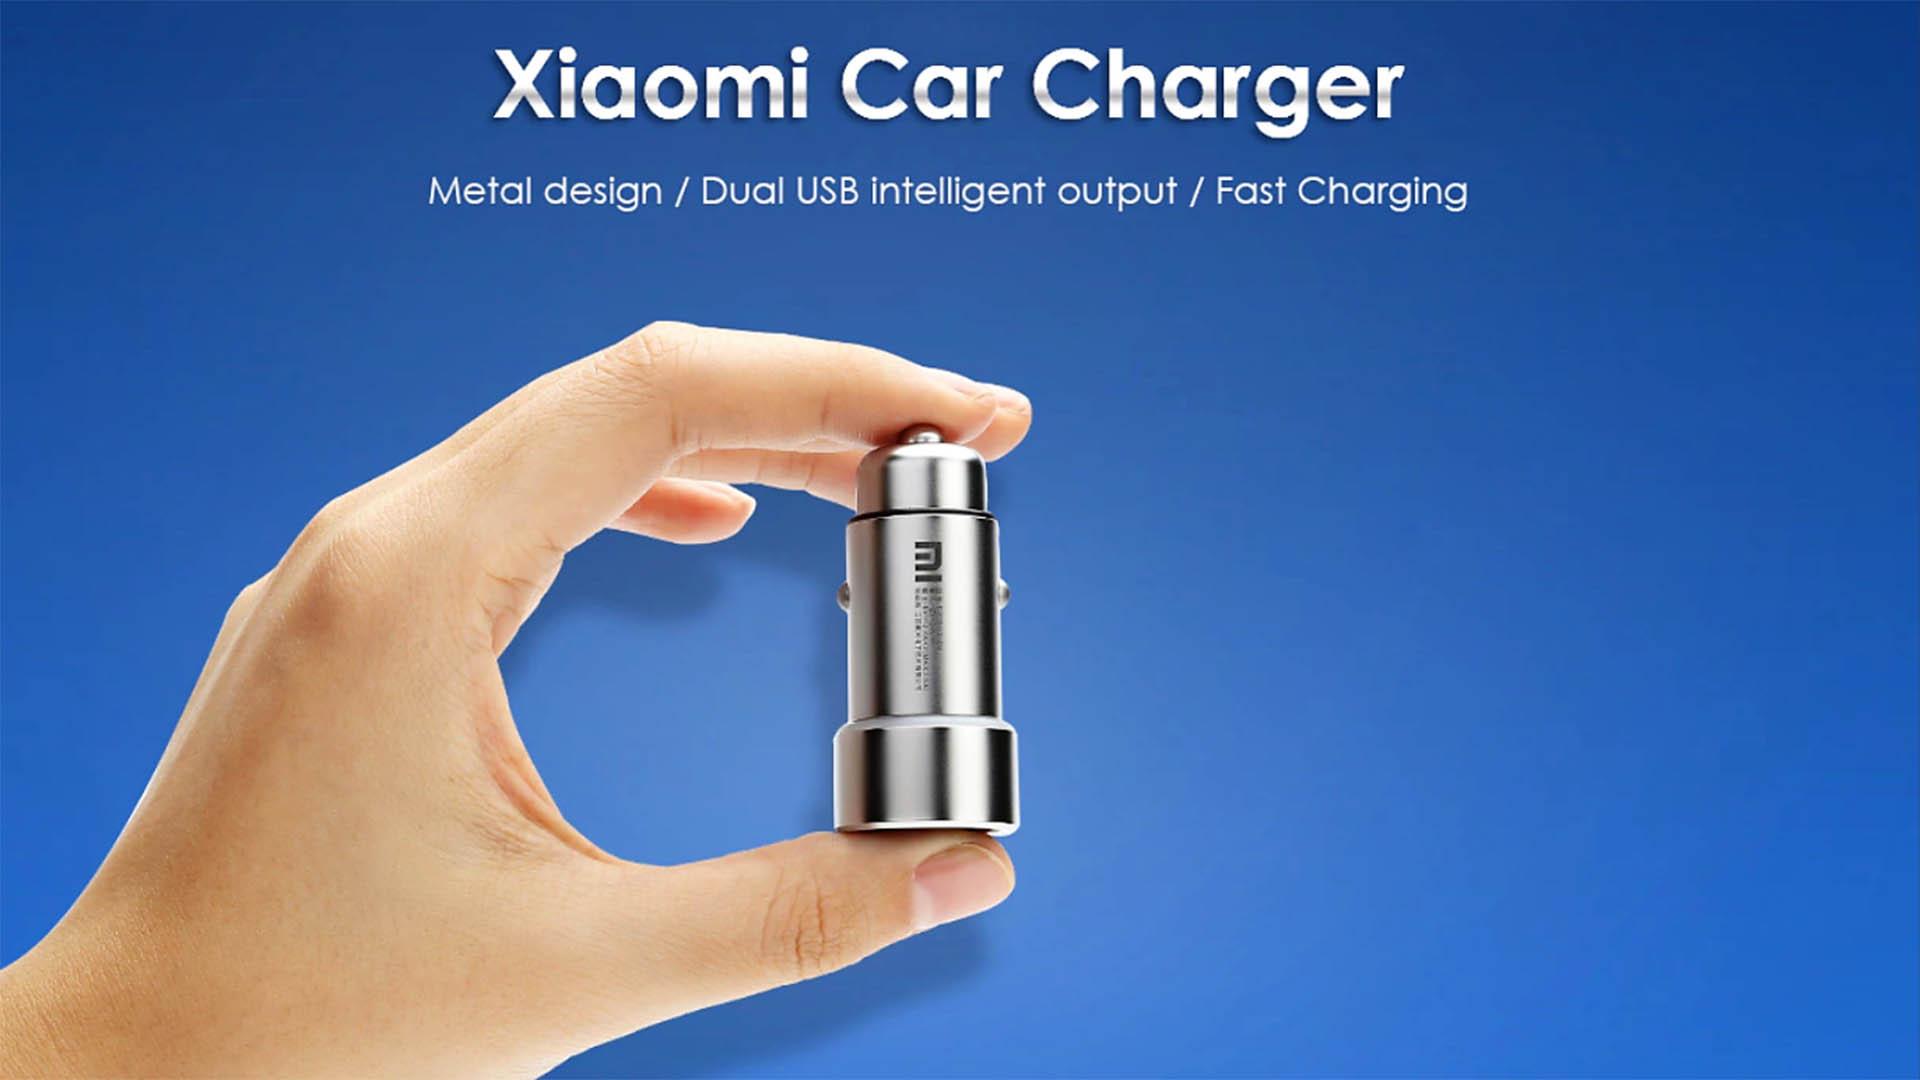 Xiaomi Fast Charging Car